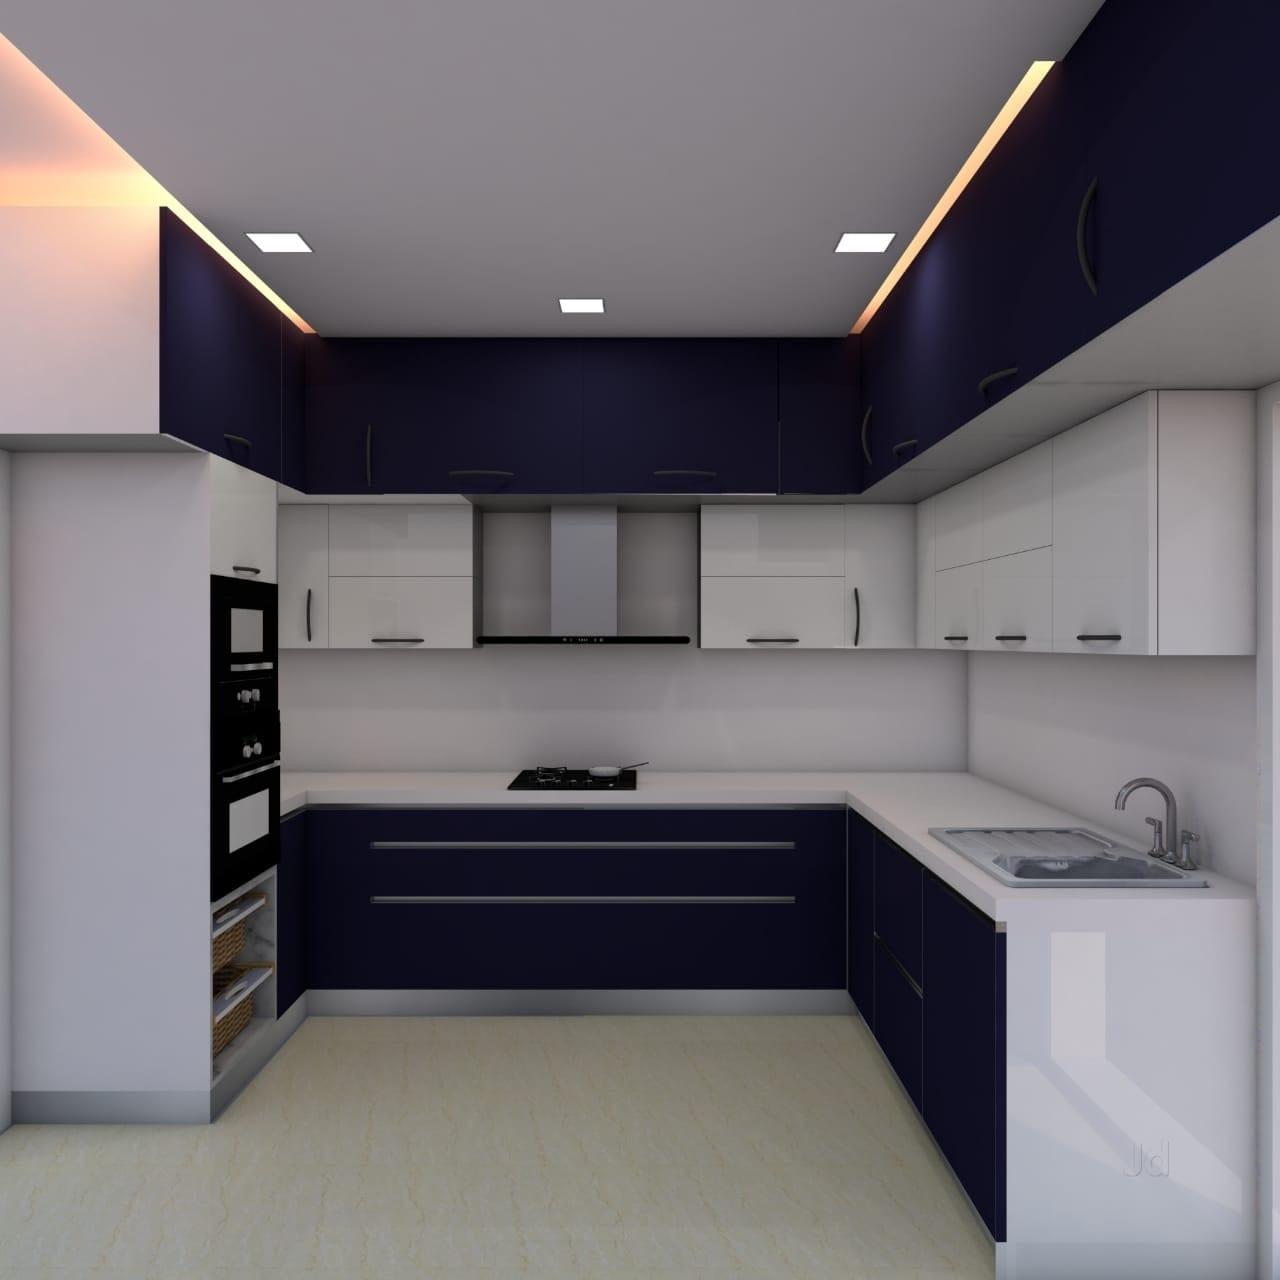 Kitchen Ideas, Manewada Road - Furniture Dealers in Nagpur - Justdial